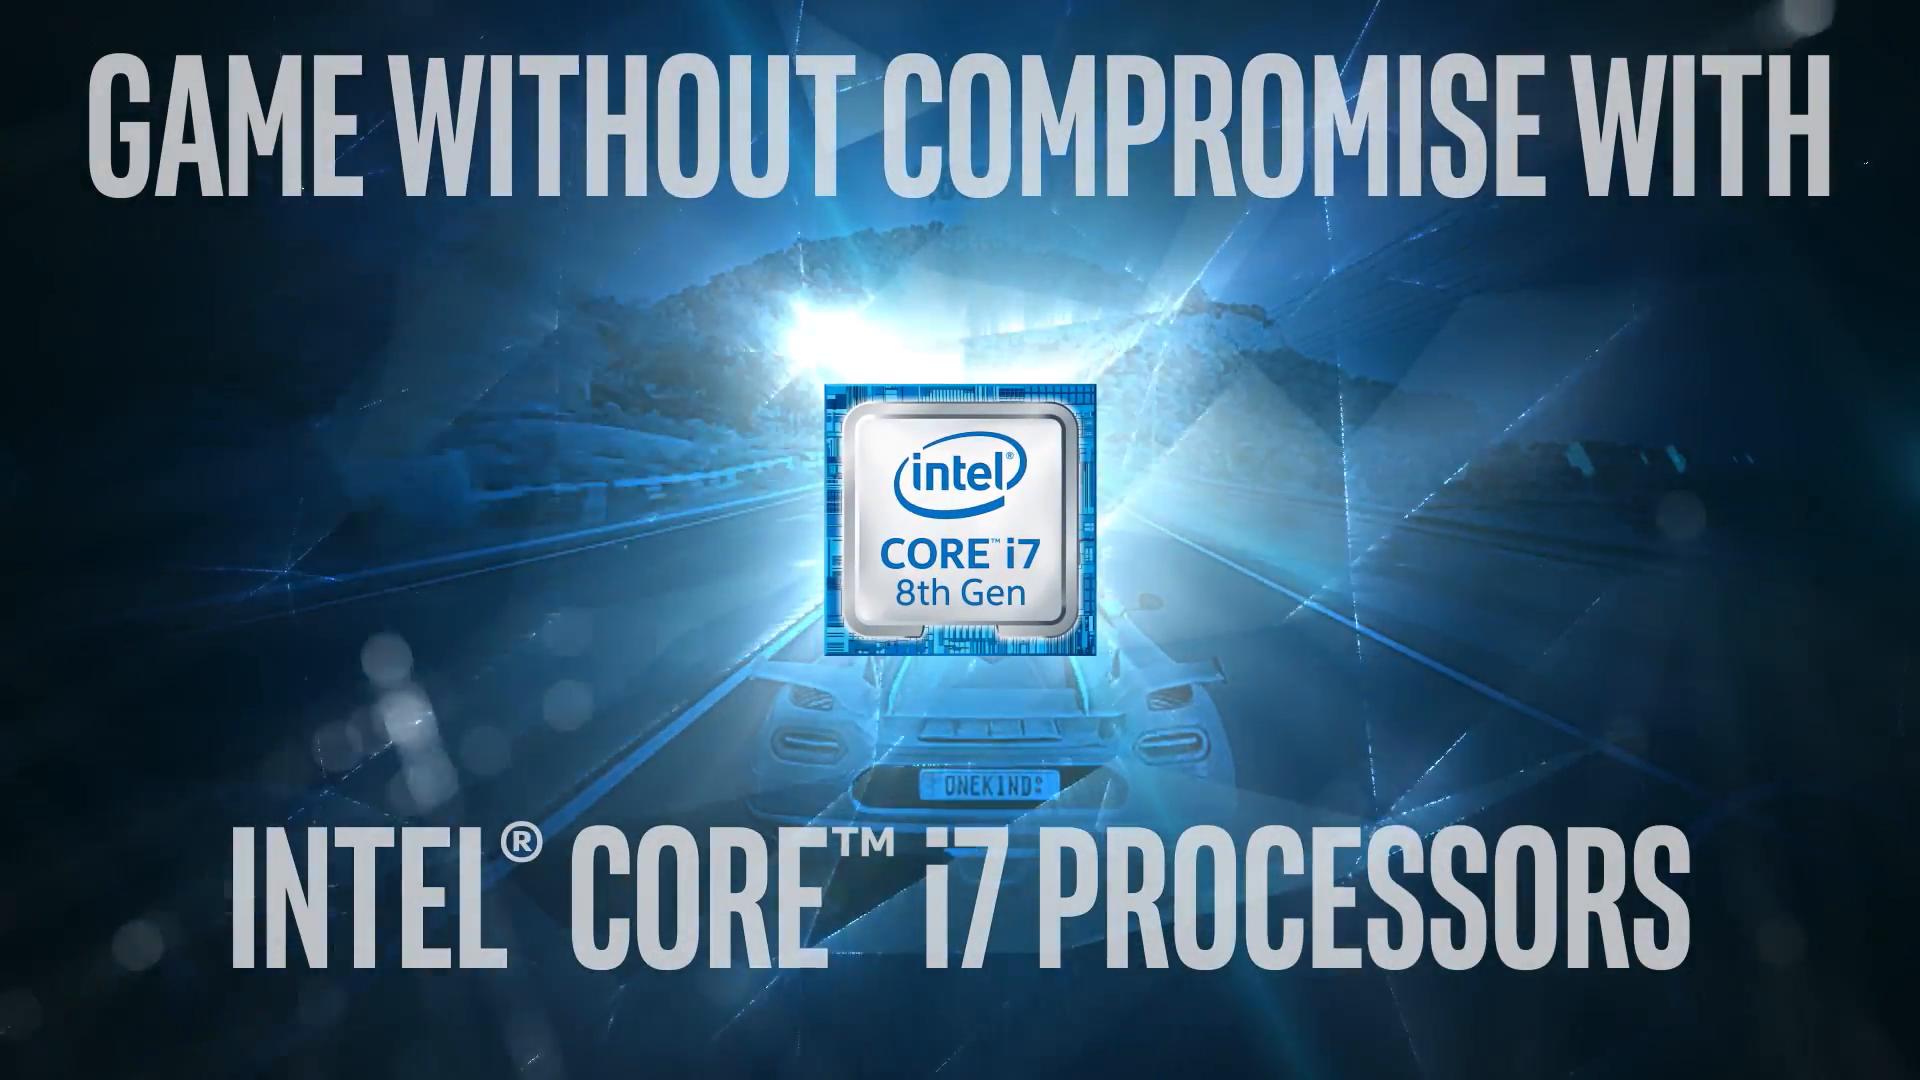 Intel Core I7 8700k Coffee Lake 6 37 Ghz 47 Turbo Lga Macau Electrical Wiring Code Download Video